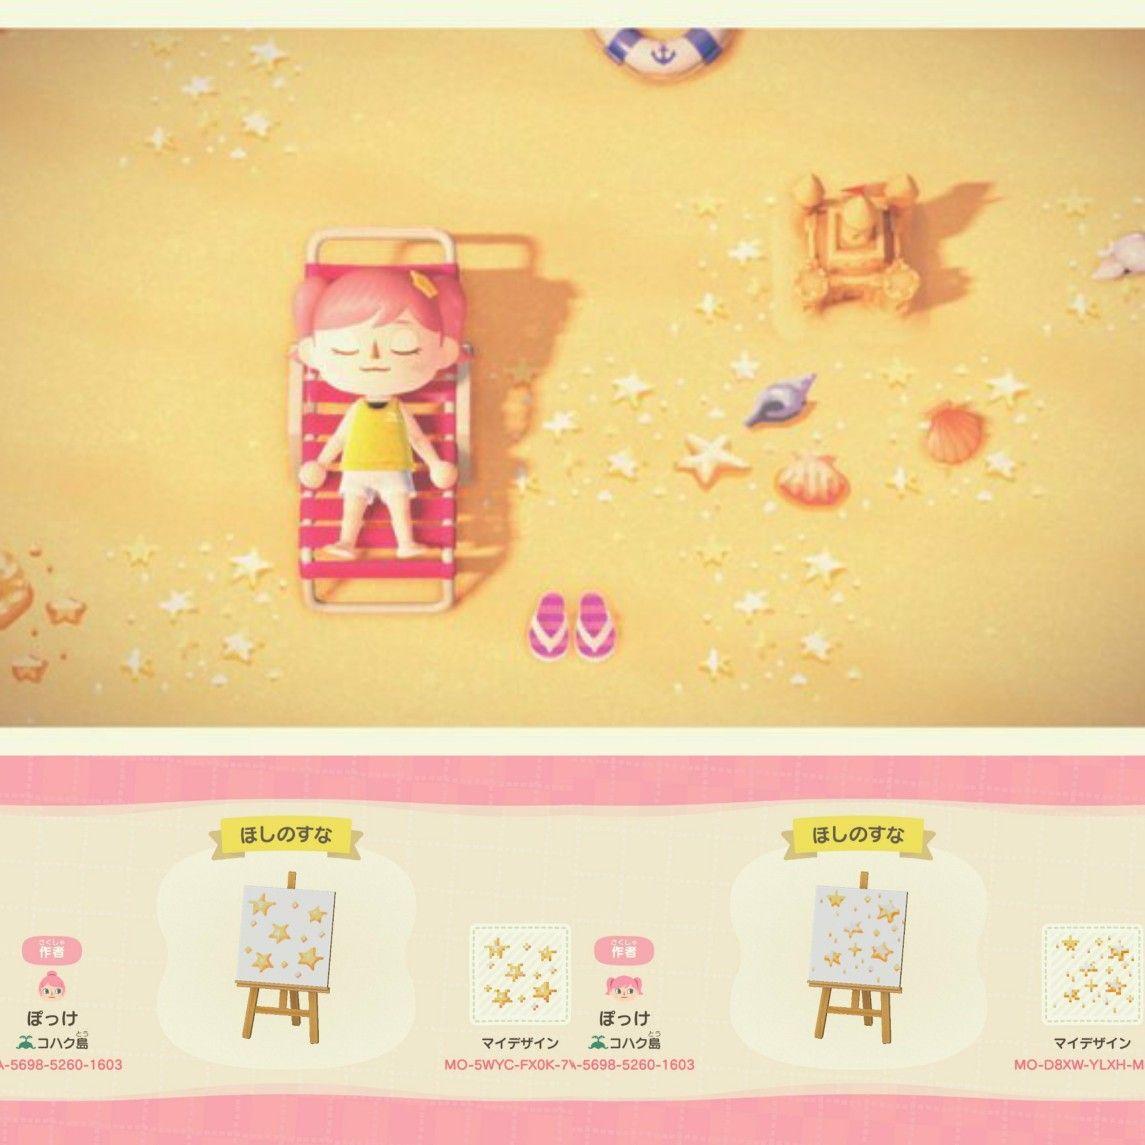 Sandy Stars Path Design Acnh Animal Crossing Animal Crossing Game Animal Crossing Villagers